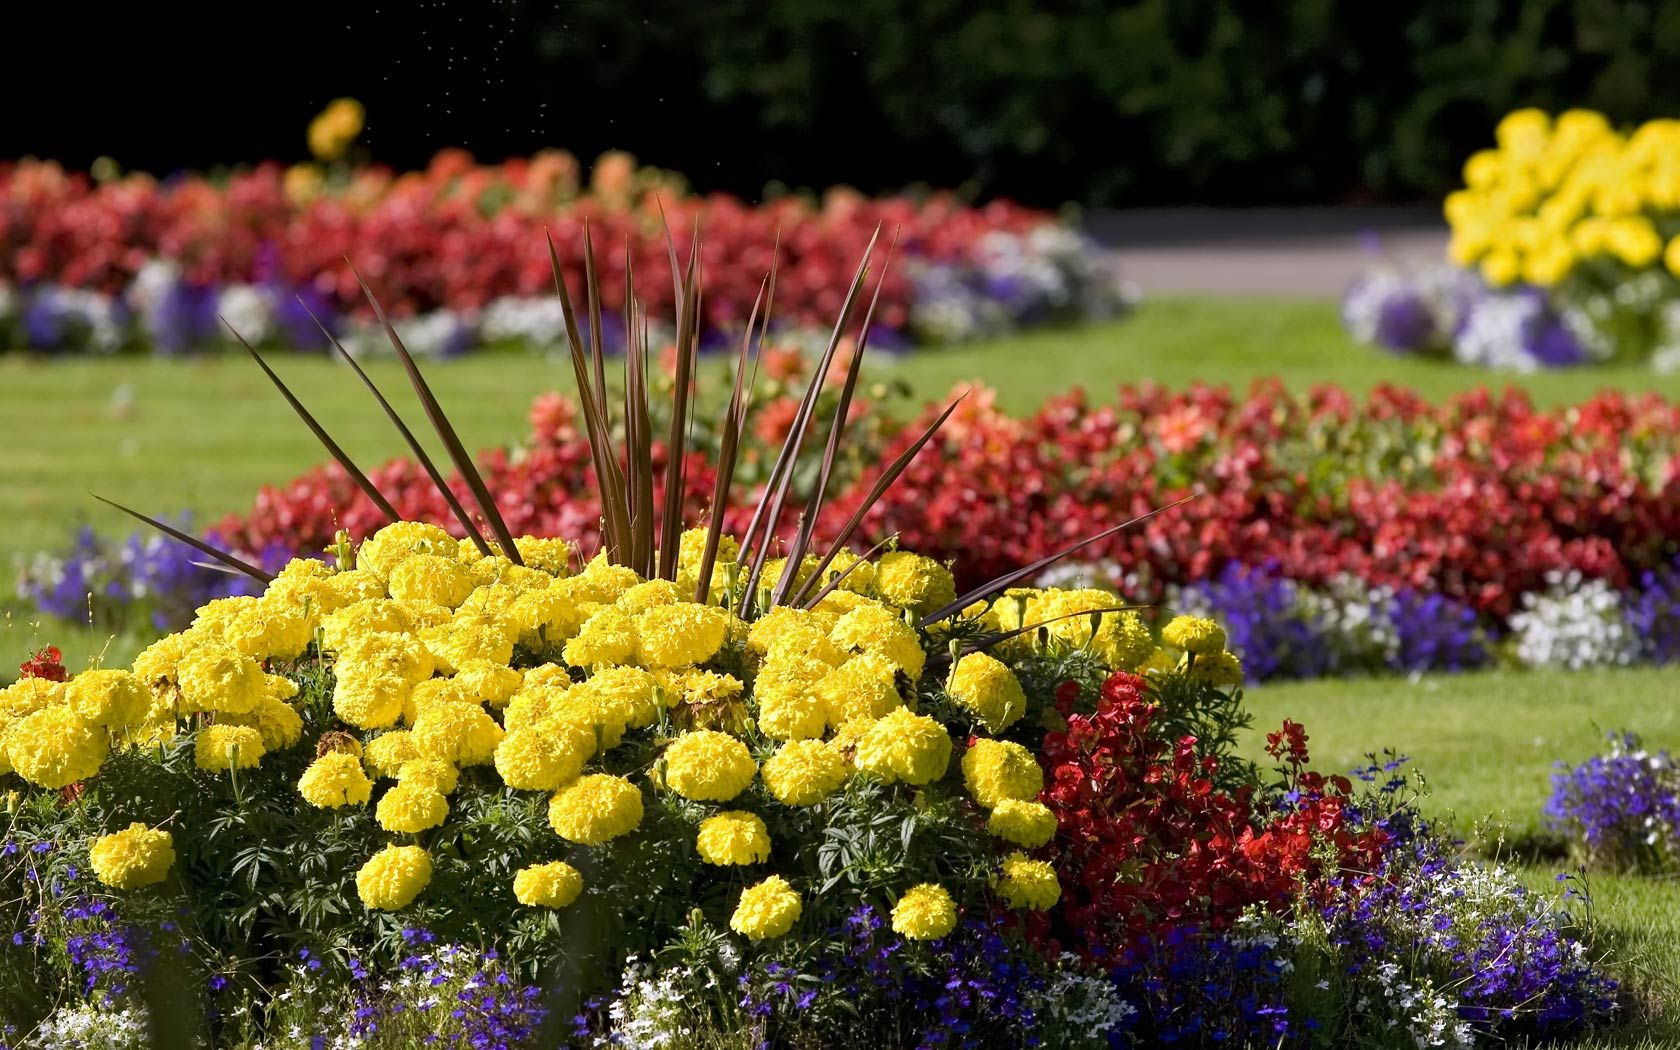 Small Flower Rock Garden Designs Annual Flower Beds Designs That